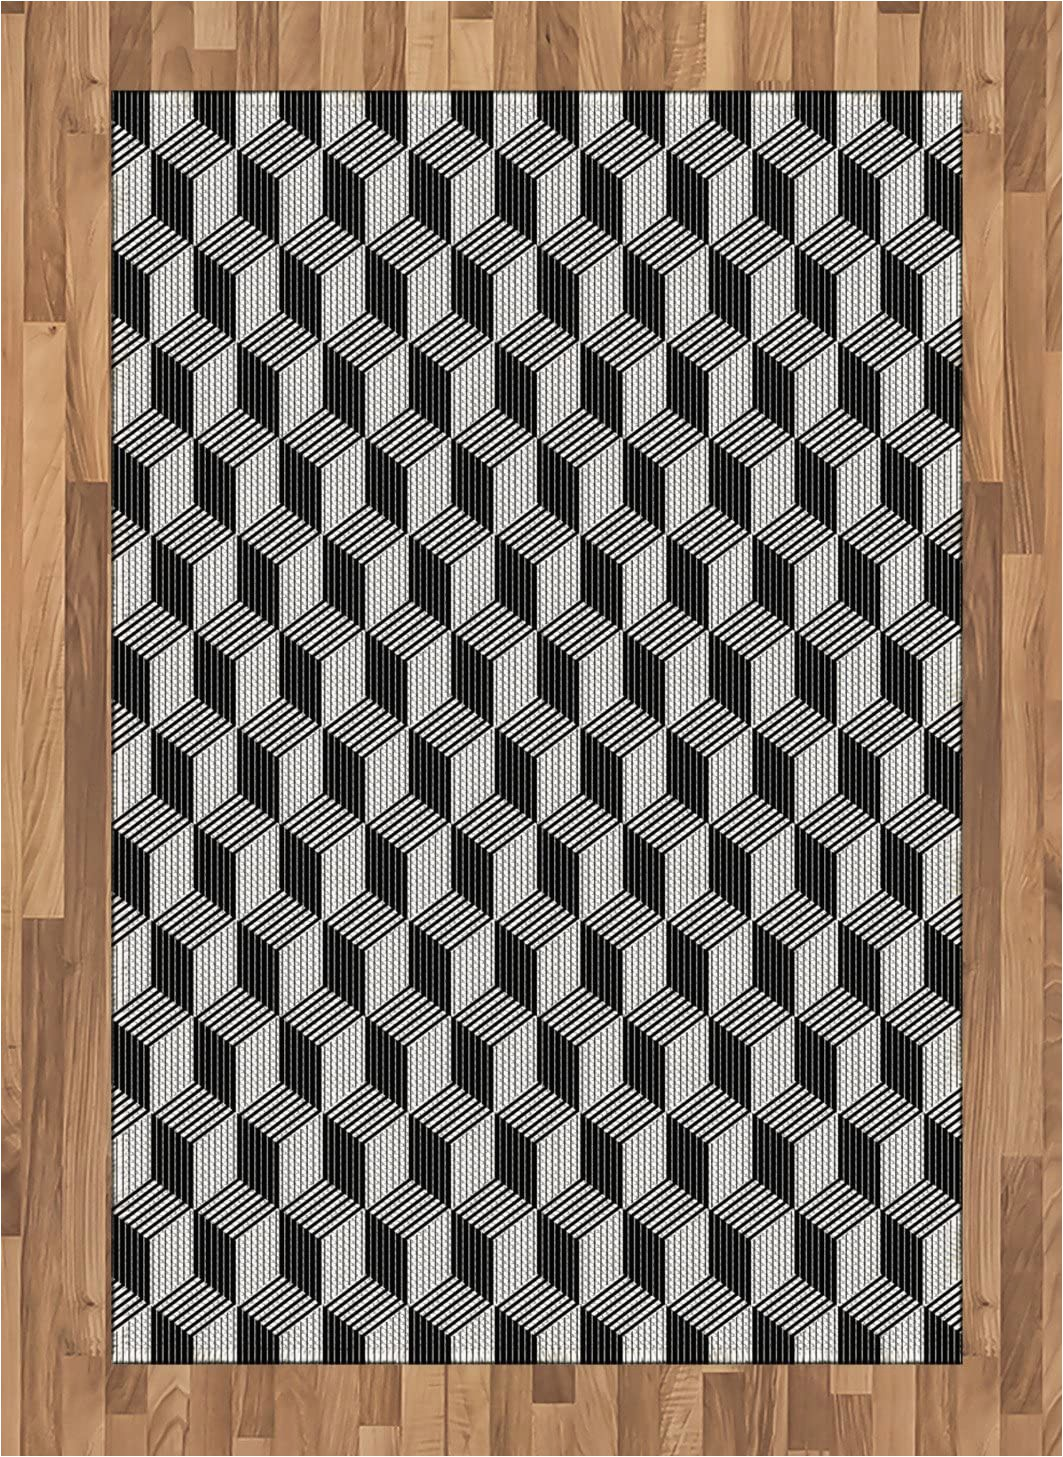 Black and White Woven area Rug Amazon Lunarable Black and White area Rug 3d Style